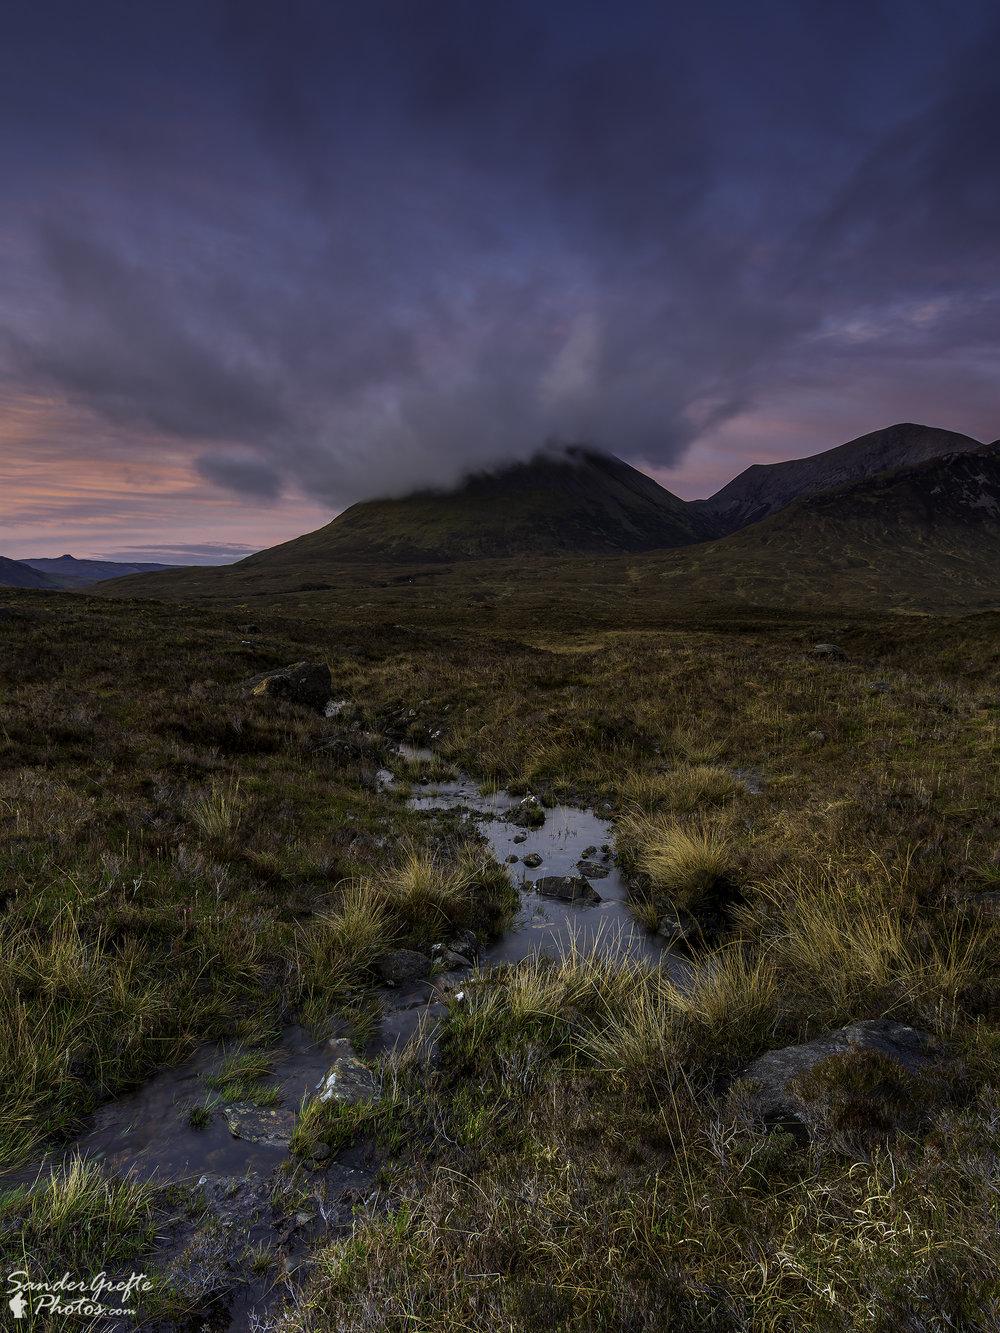 Fantastische wolken boven de Glamaig berg. (Nikon D7200, 12mm, iso 100, f11, 3s met NiSi polarizer en 0.9 GND)